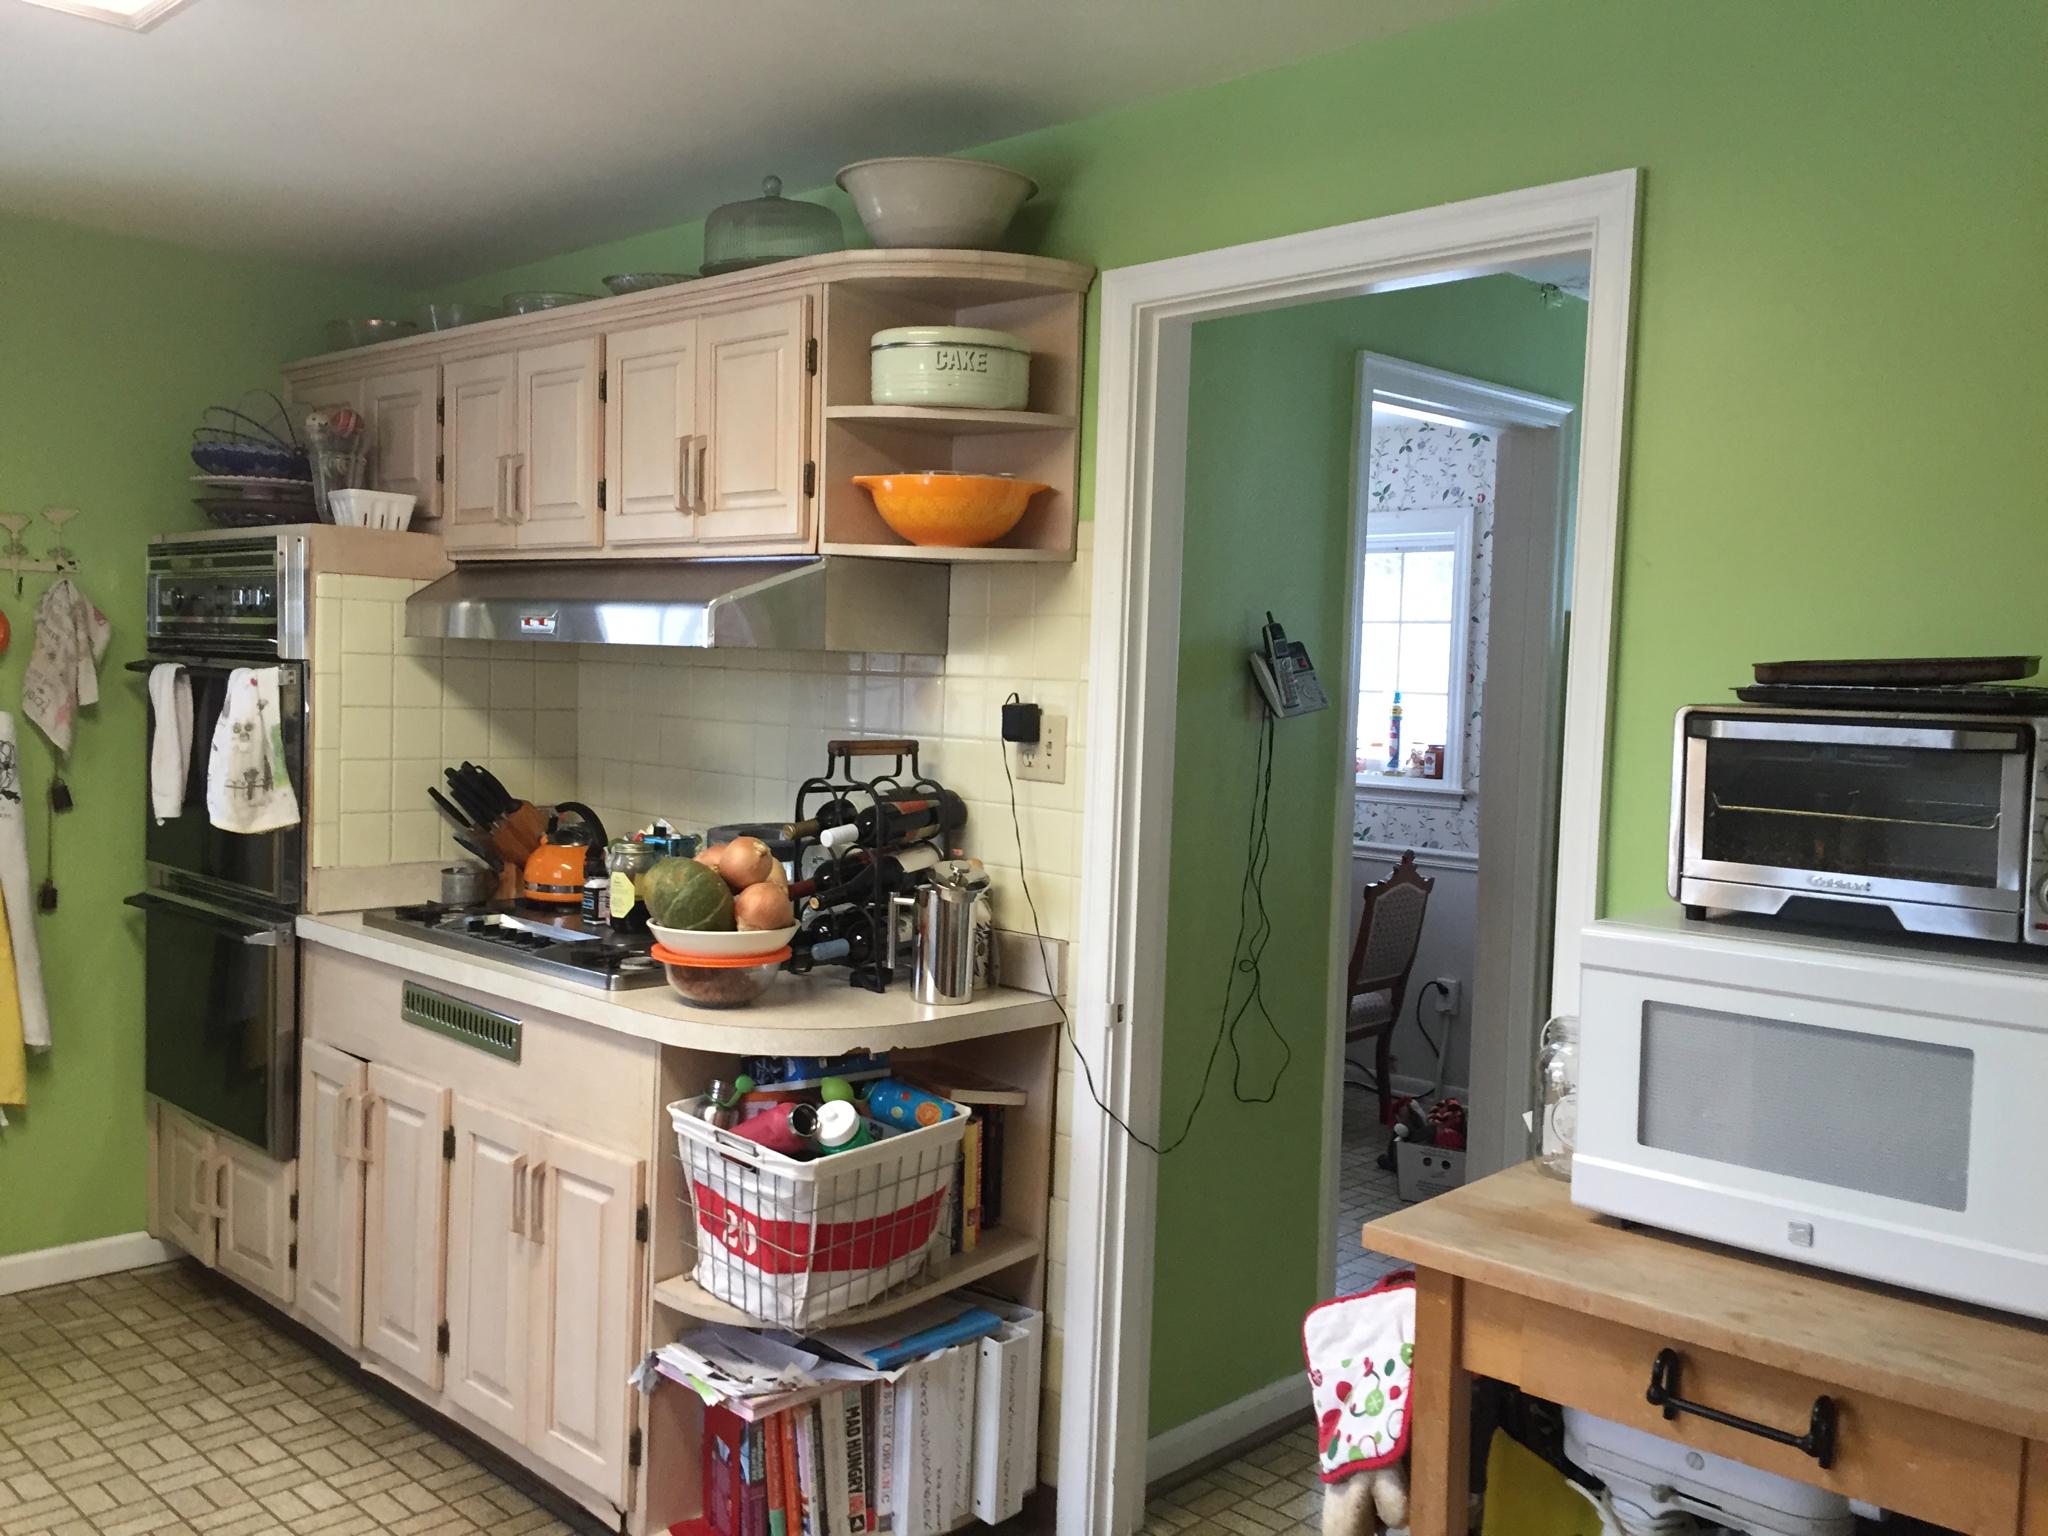 Evalia_Farmhouse Renovation_Before_0405.jpg